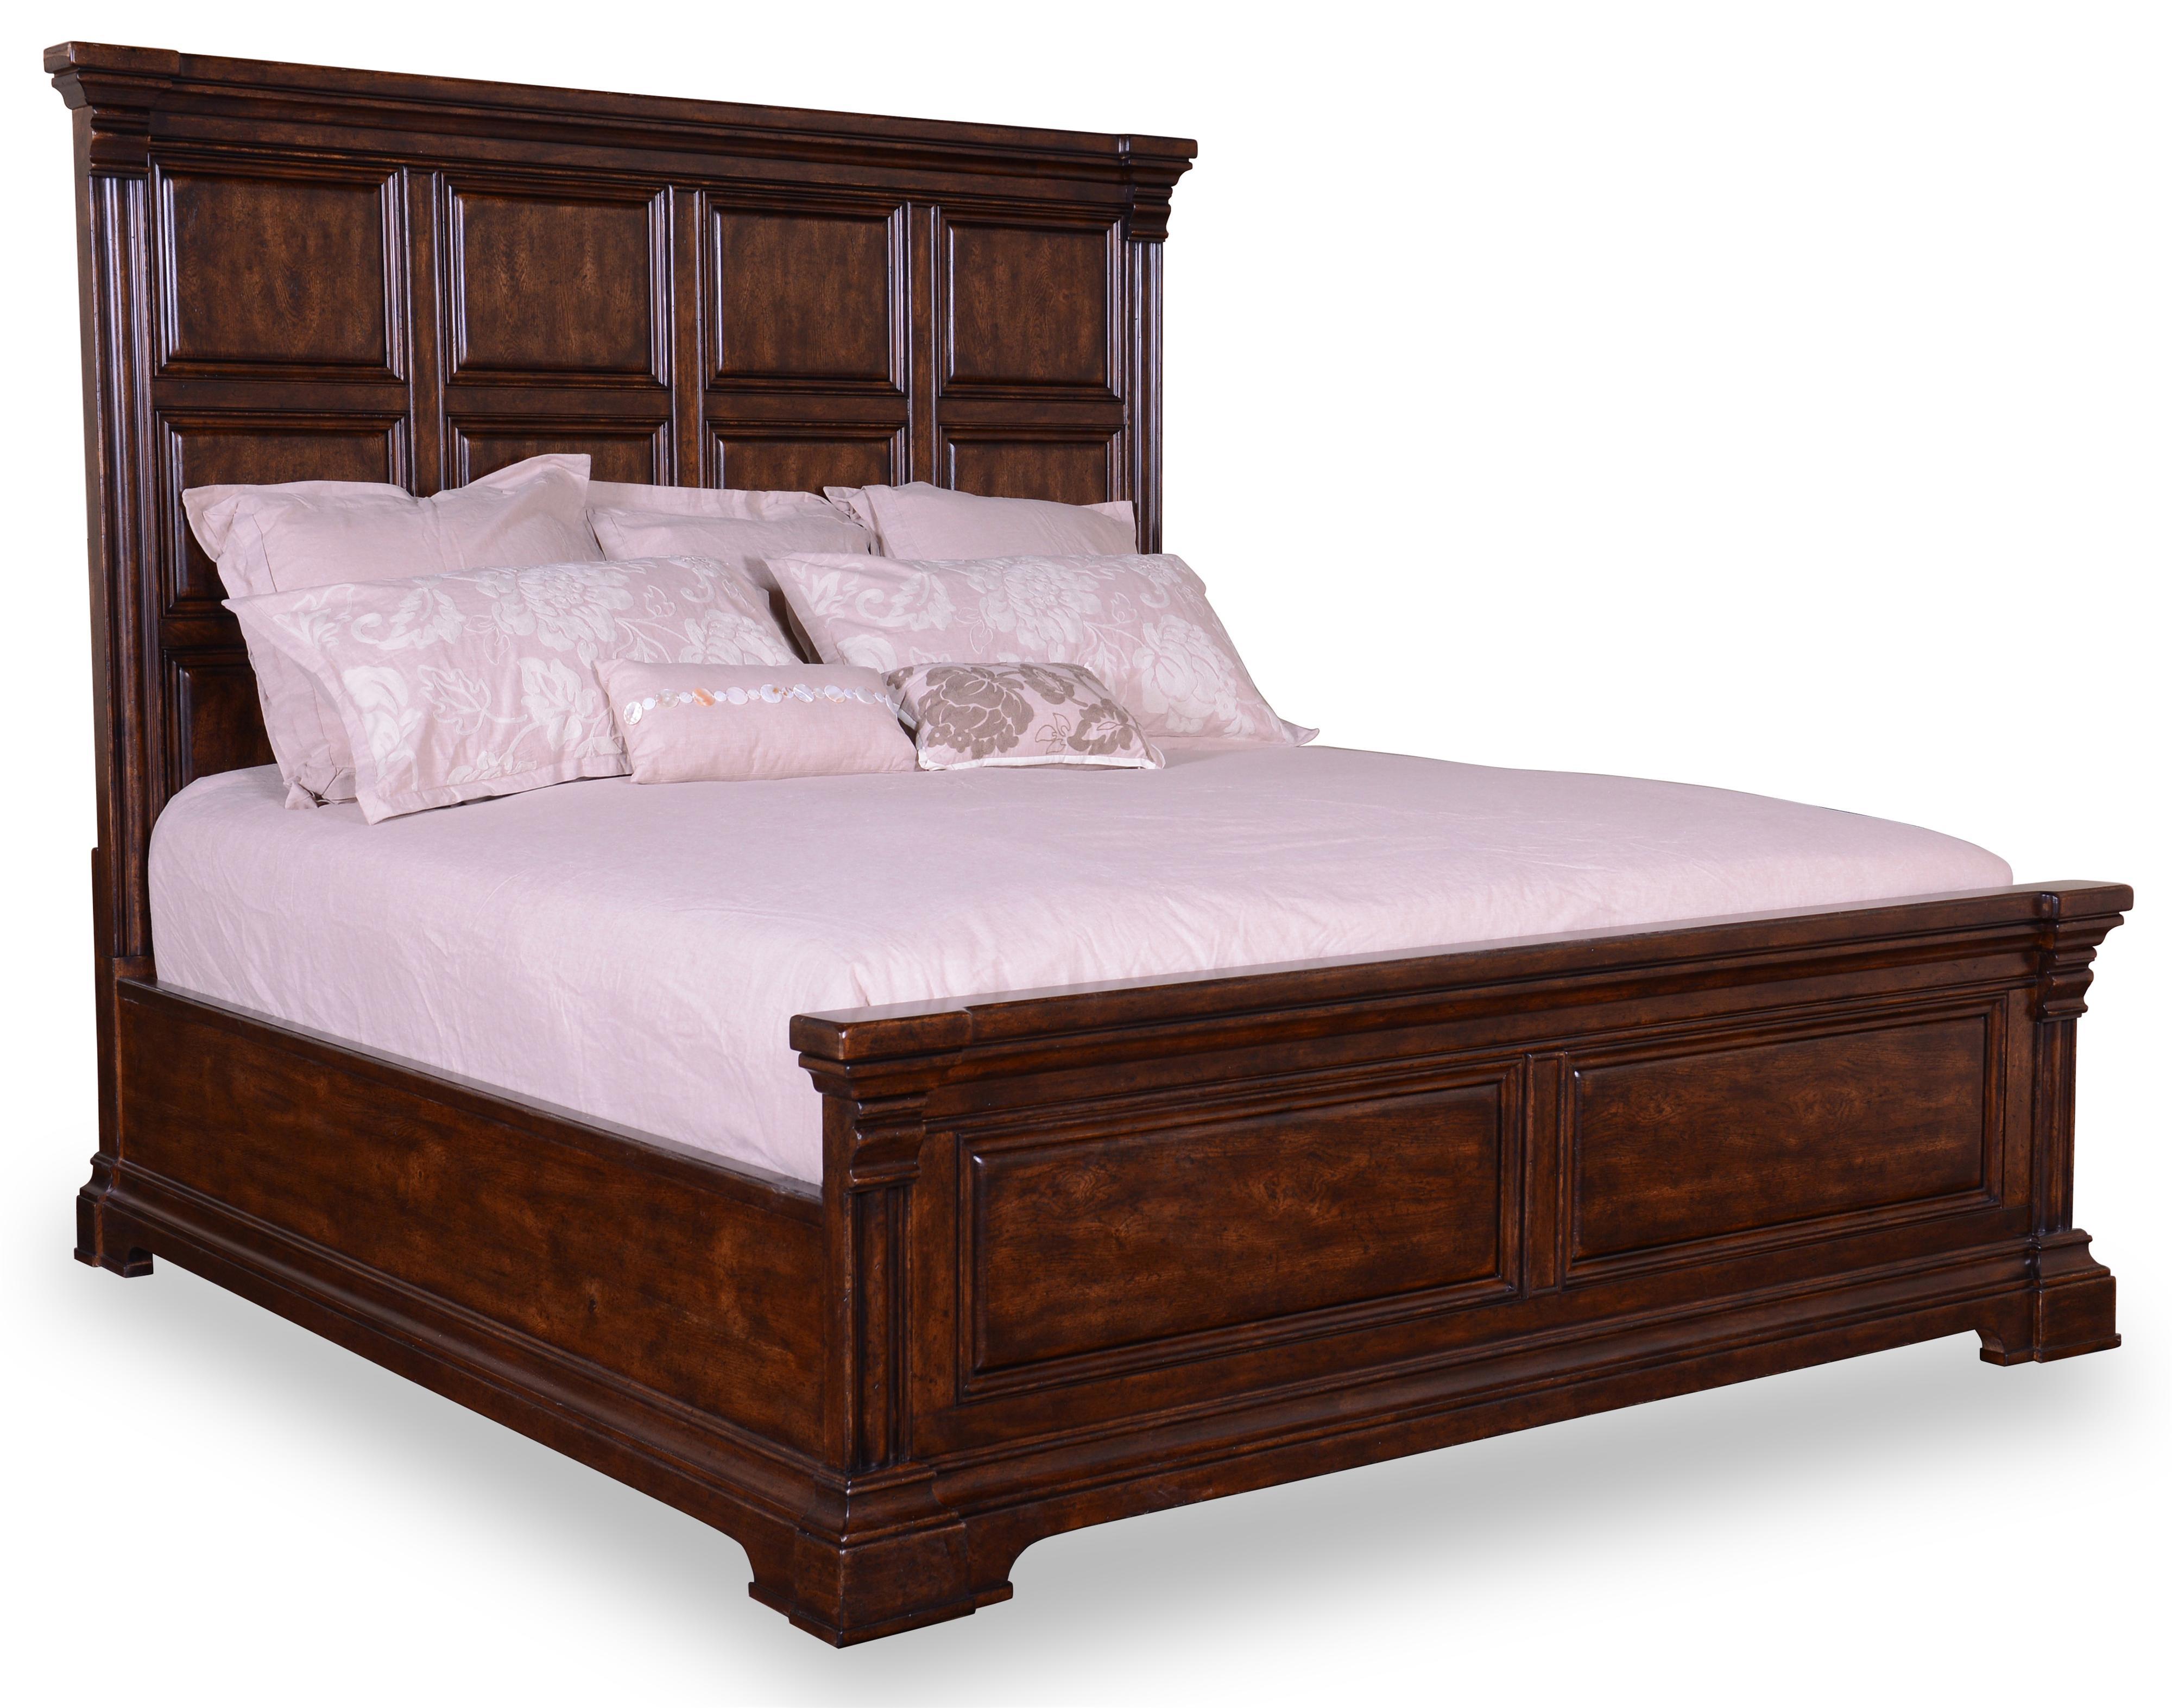 art furniture inc whiskey oak queen panel bed item number 205125 2304hb - Panel Bed Frame